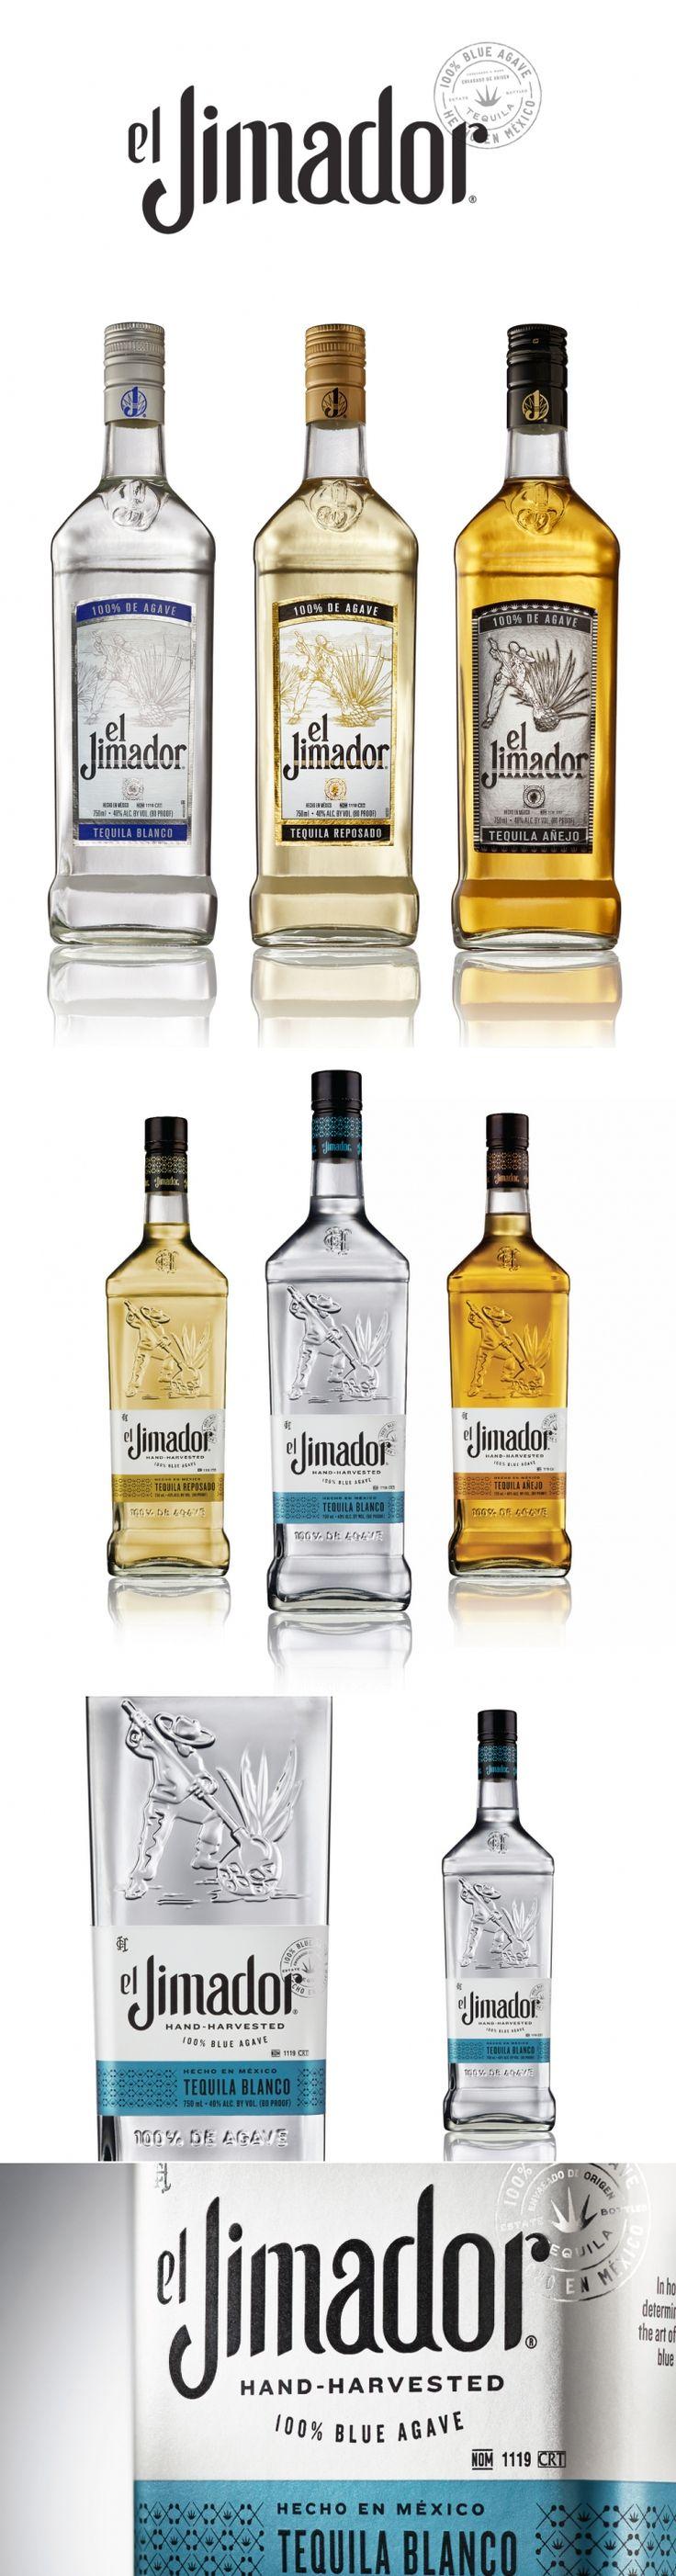 Before & After: el Jimador Tequila — The Dieline | Packaging & Branding Design & Innovation News